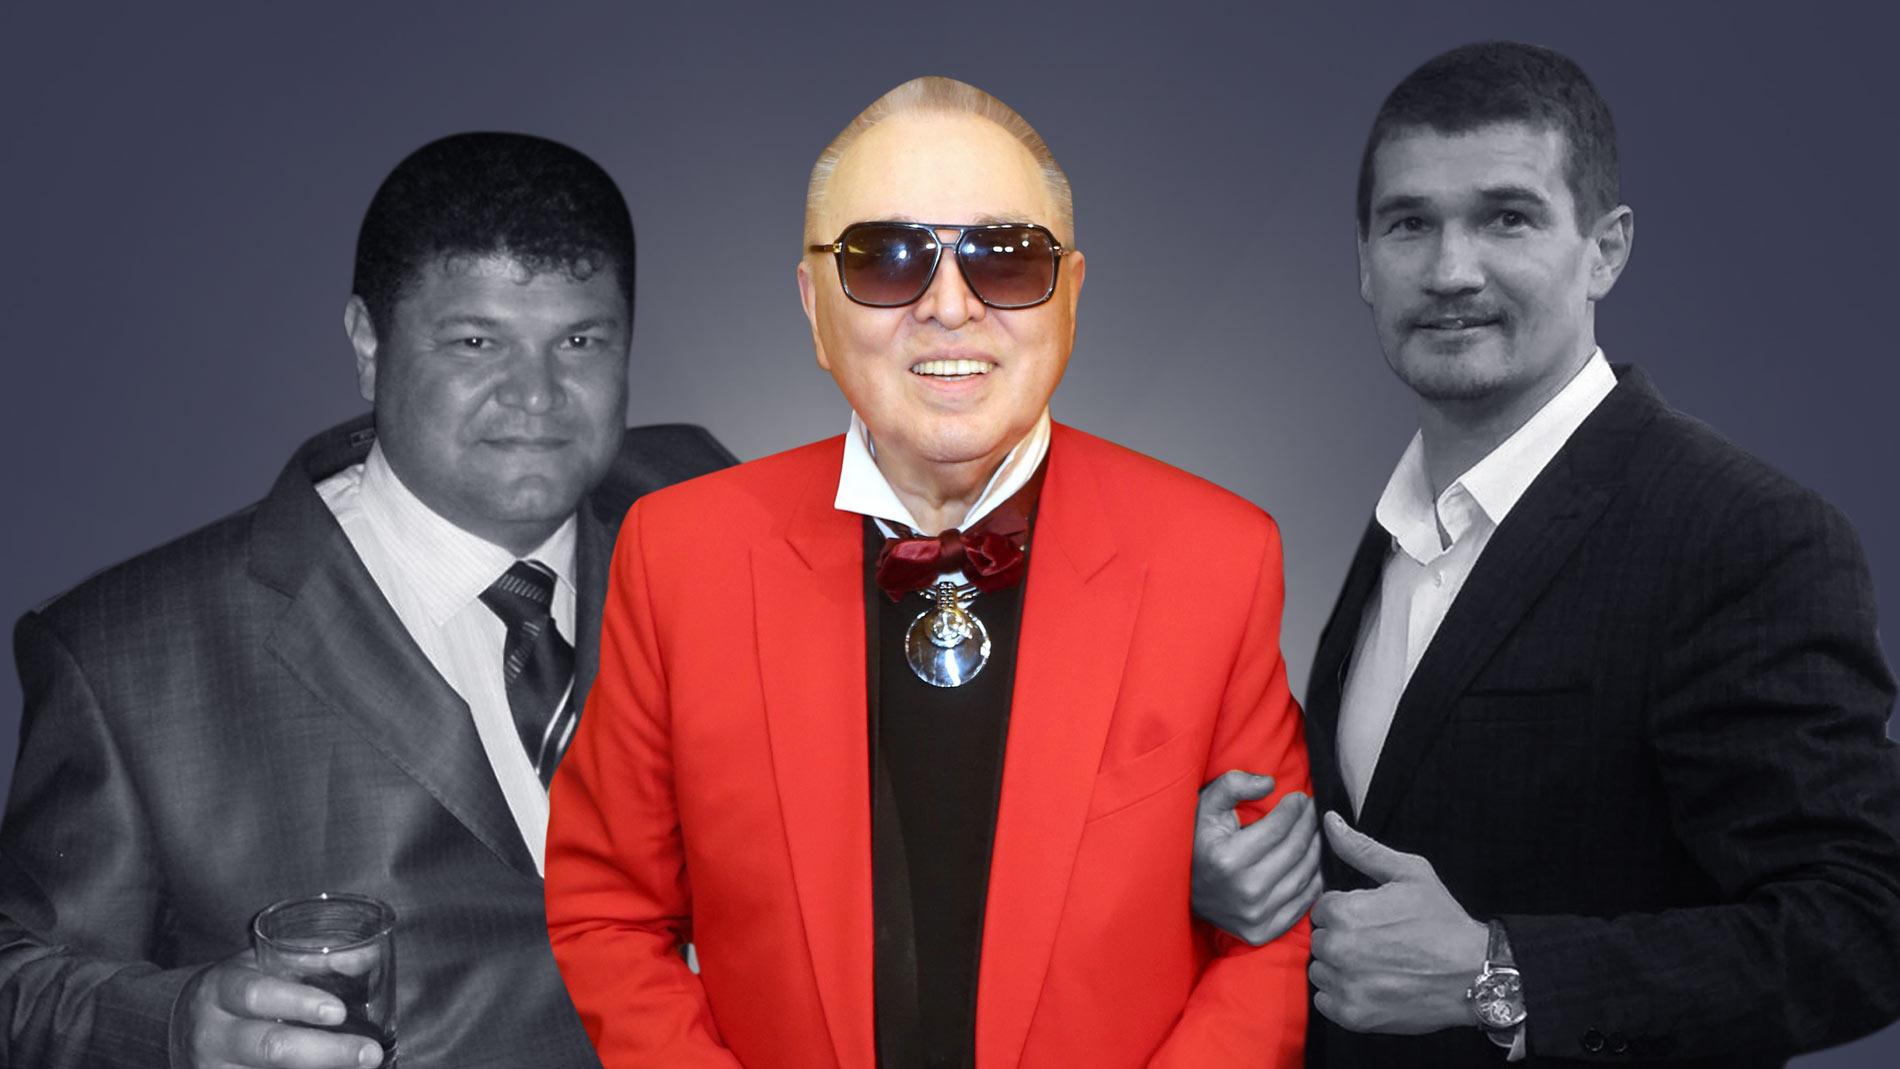 "<p>Коллаж © LIFE. Фото ©ТАСС / Тараканов Вадим, <a href=""https://vk.com/vadimkhusainov?z=photo57090266_457244354/photos57090266"" target=""_blank"" rel=""noopener noreferrer"">vk.com/vadimkhusainov</a>, <a href=""https://vk.com/id3233248?z=photo3233248_457239520/photos3233248"" target=""_blank"" rel=""noopener noreferrer"">vk.com/almaz</a></p>"